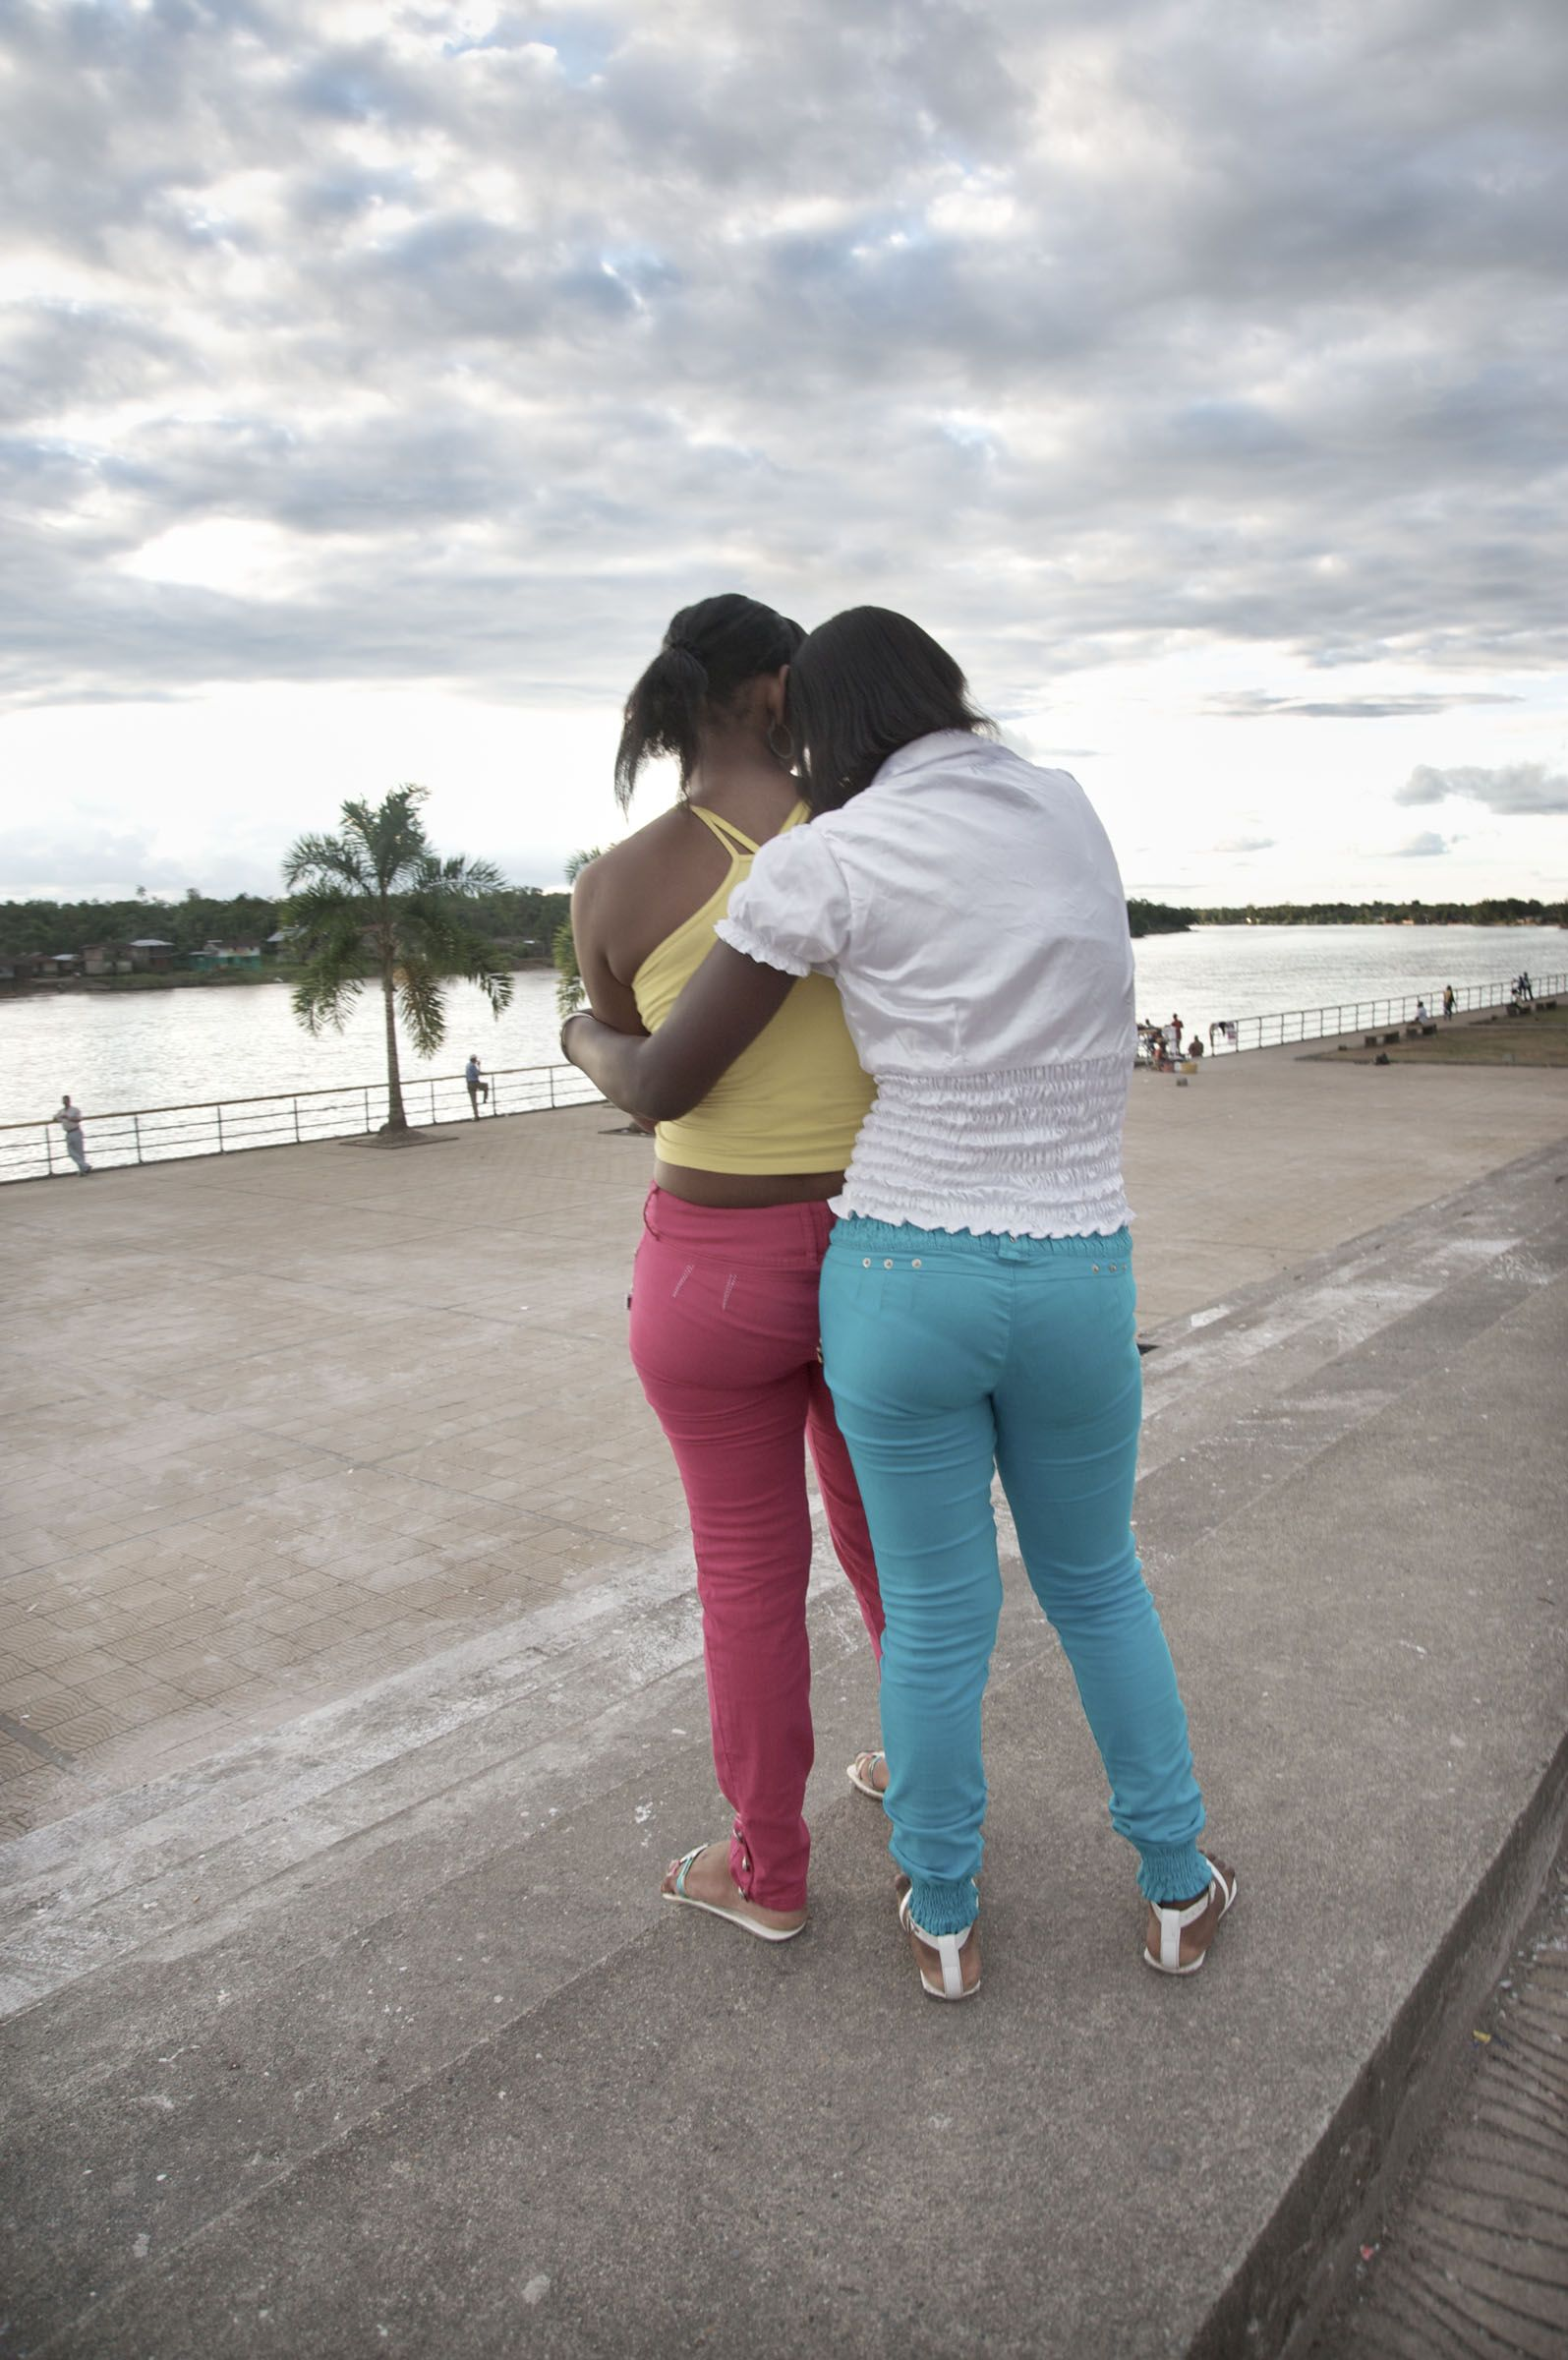 Andre_Cypriano_afrocolombianos  4910_publicidade.jpg